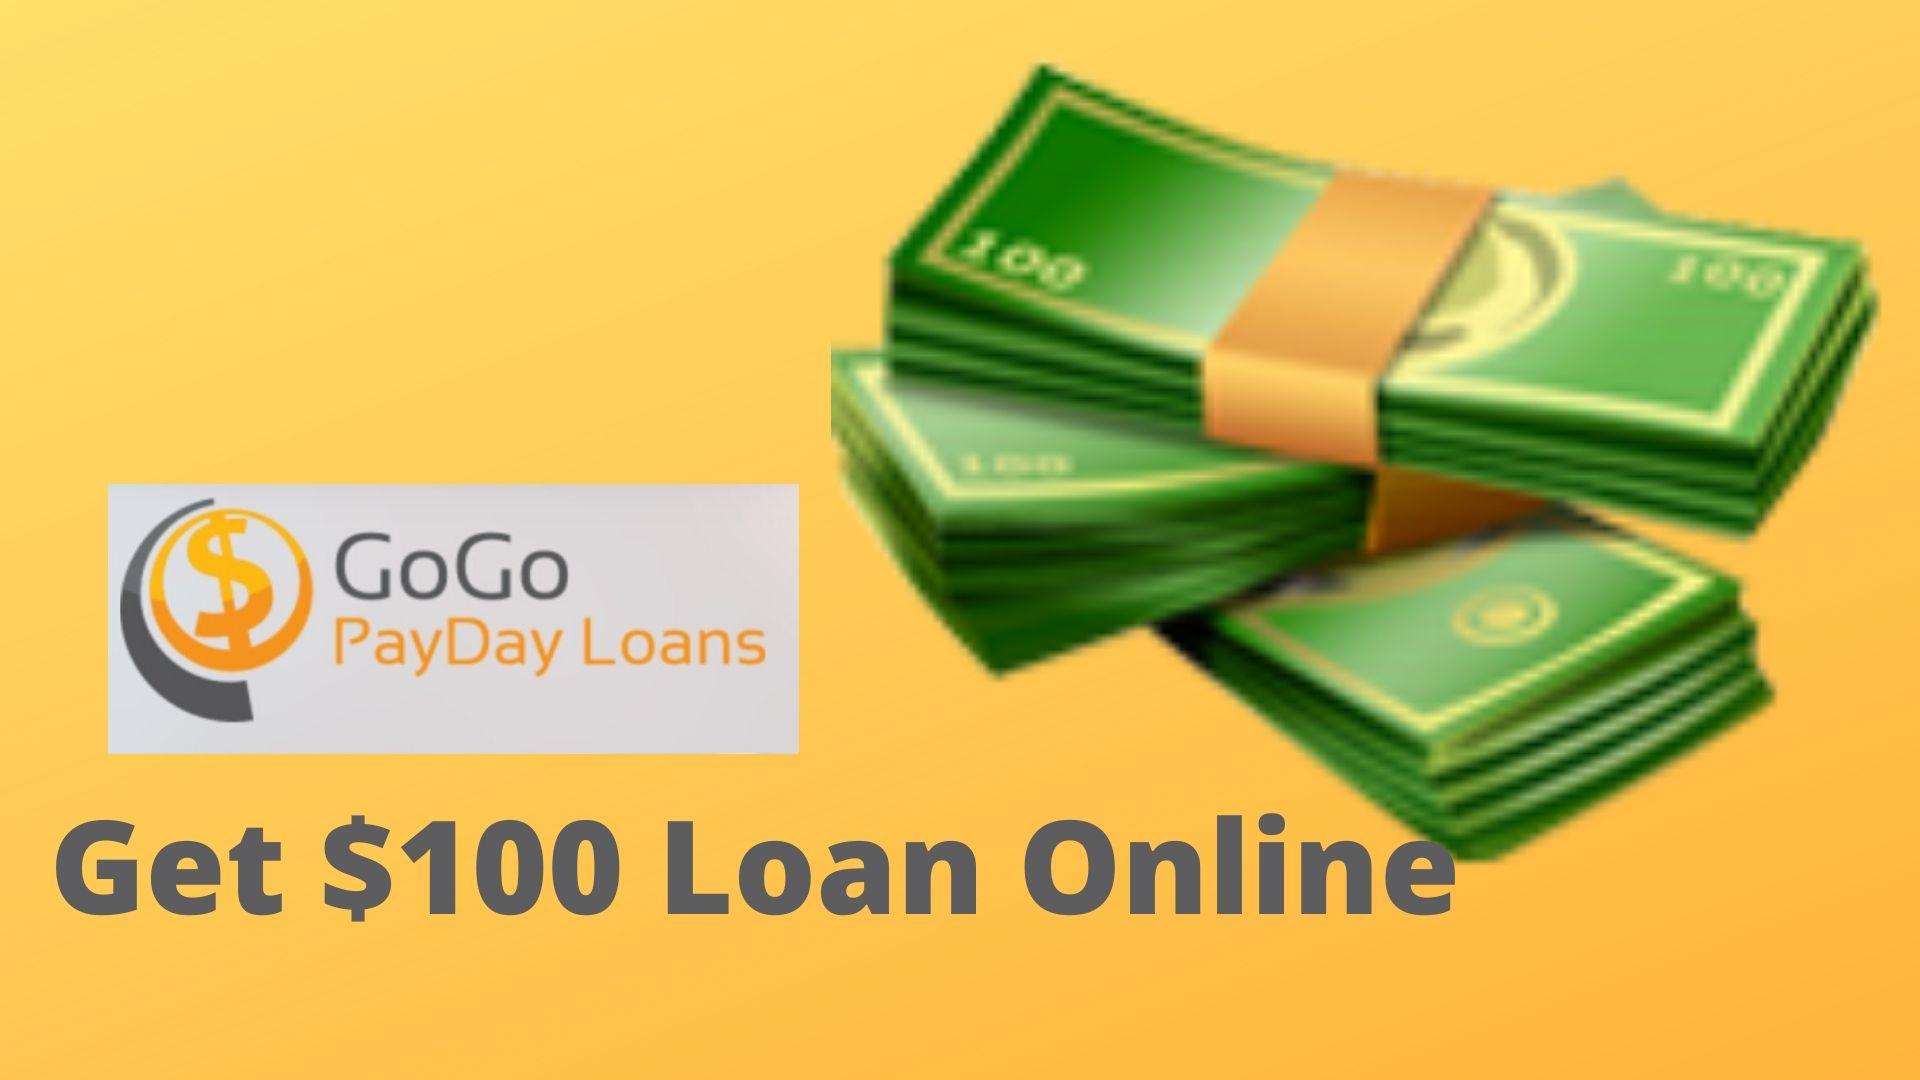 100-dollar loans